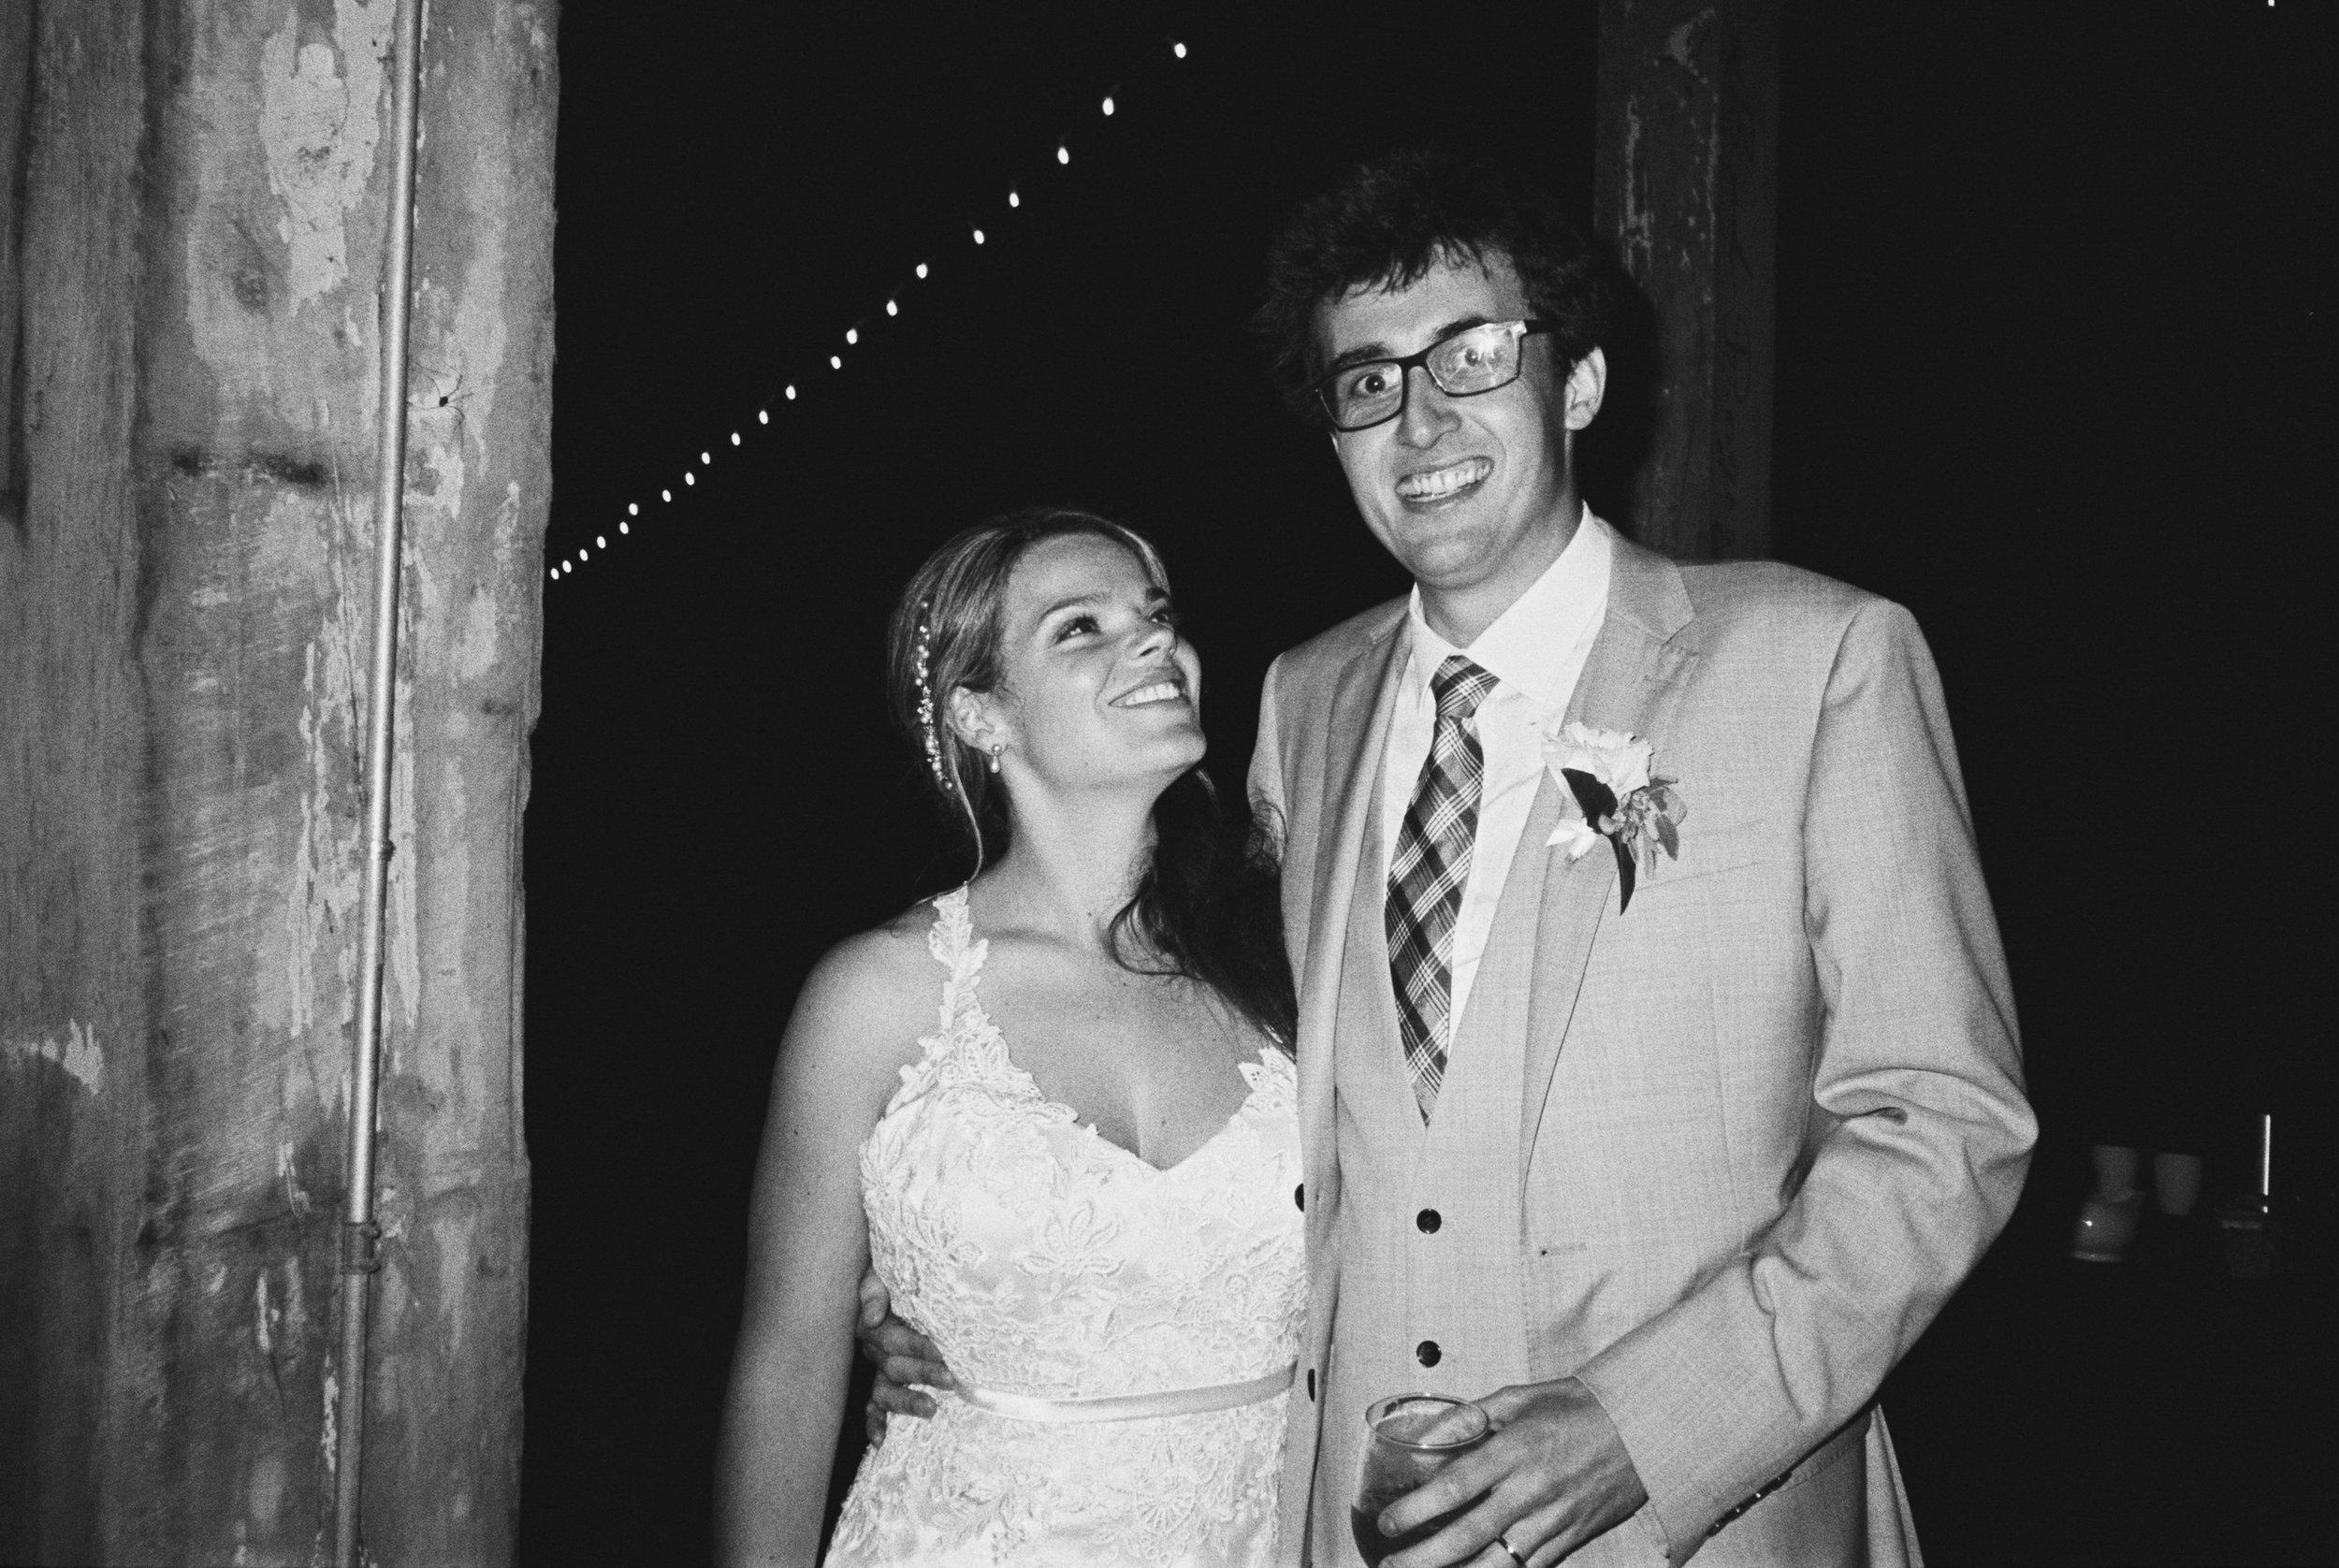 Abby_Simon_Wedding_Abigail_Malone_Photography_nashville_Bloomsbury_Farm-692.jpg